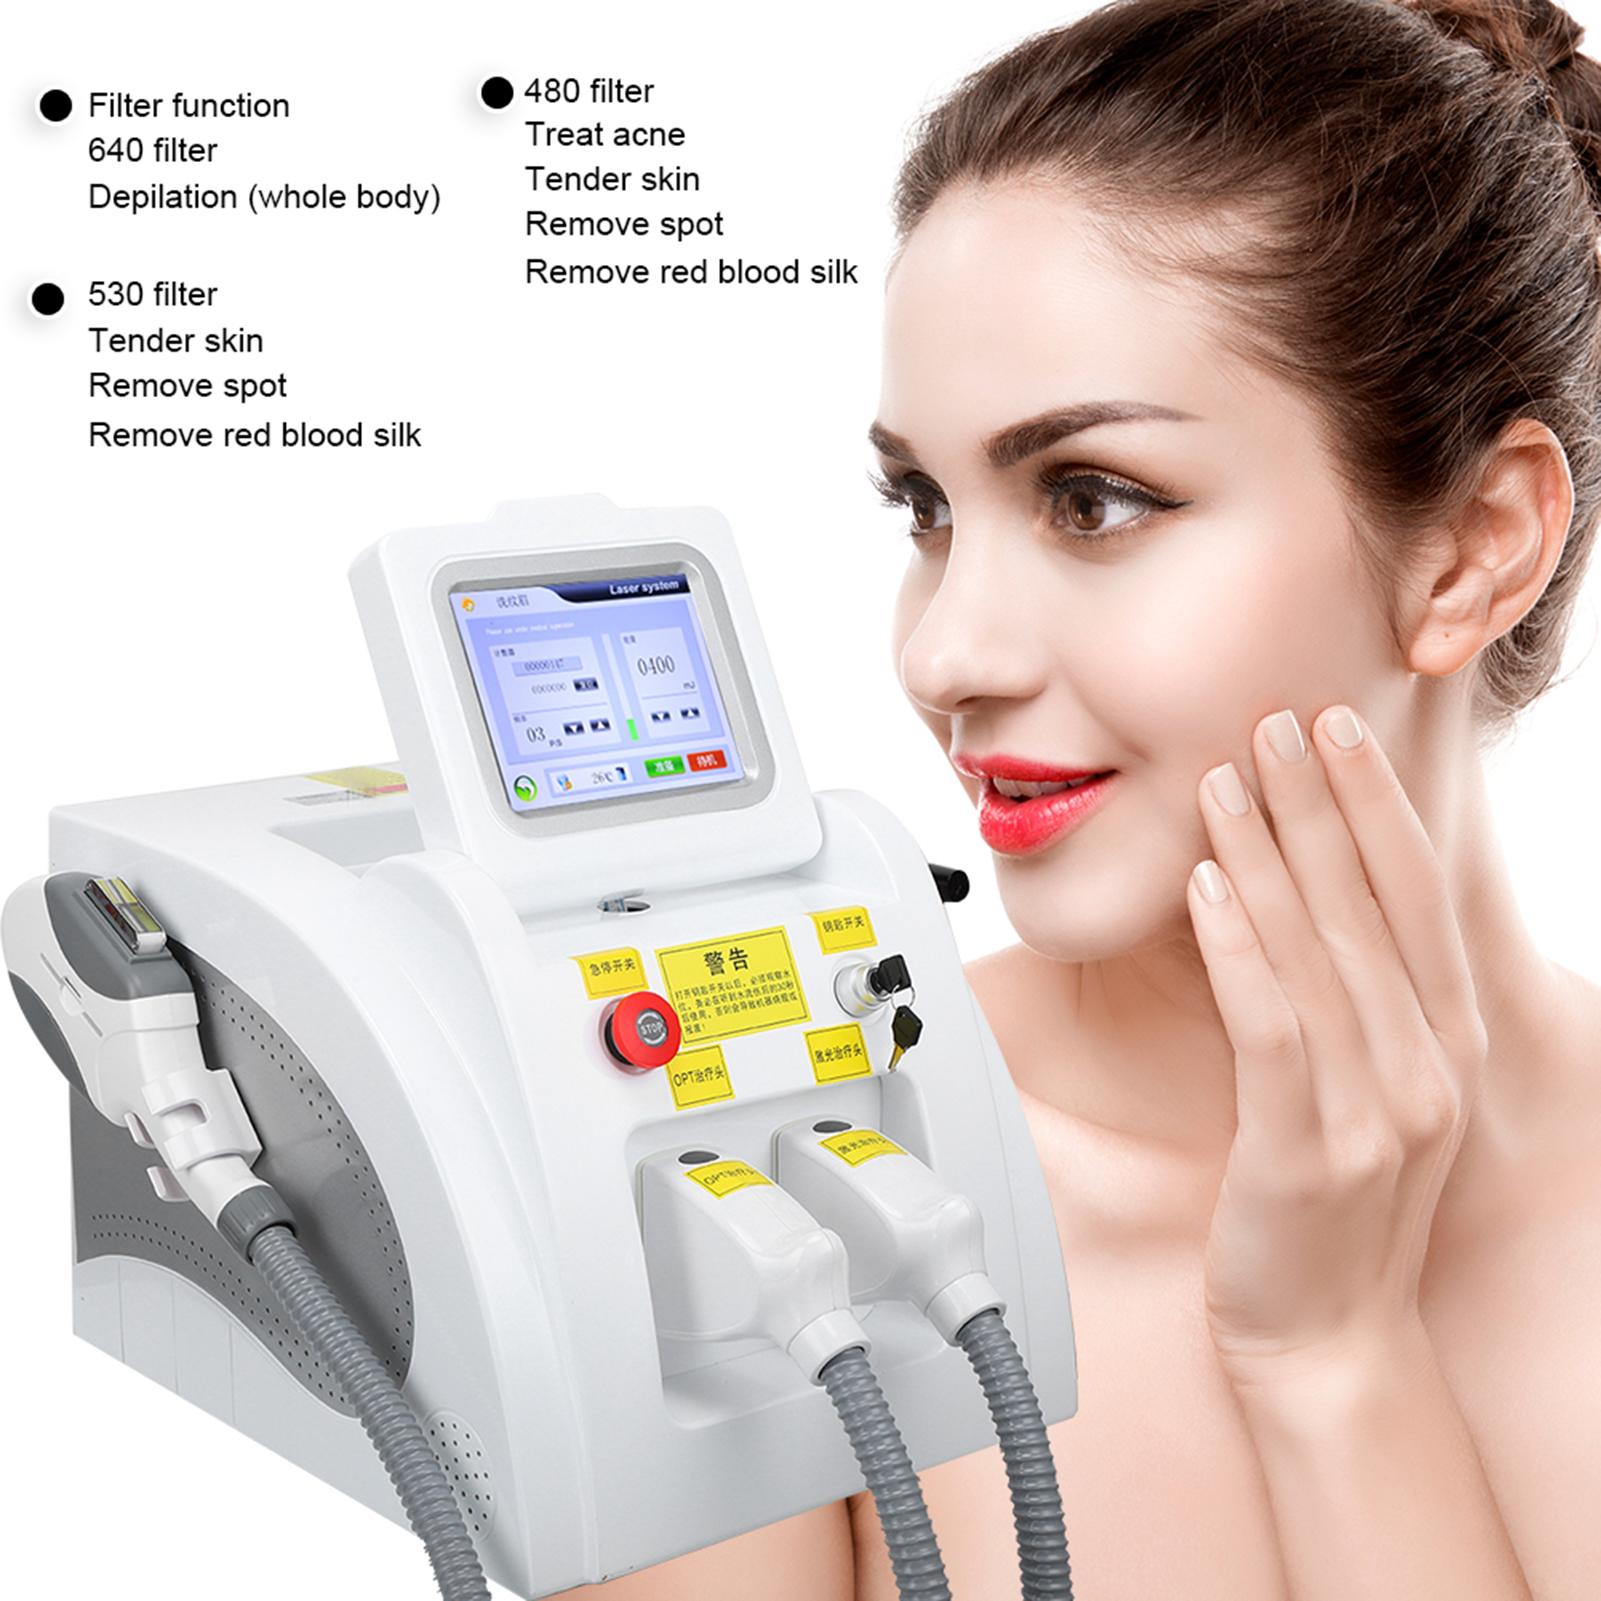 Indexbild 19 - 2In1 SHR OPT IPL Hair Removal RF Laser Skin Rejuvenation Tattoo Removal Machine